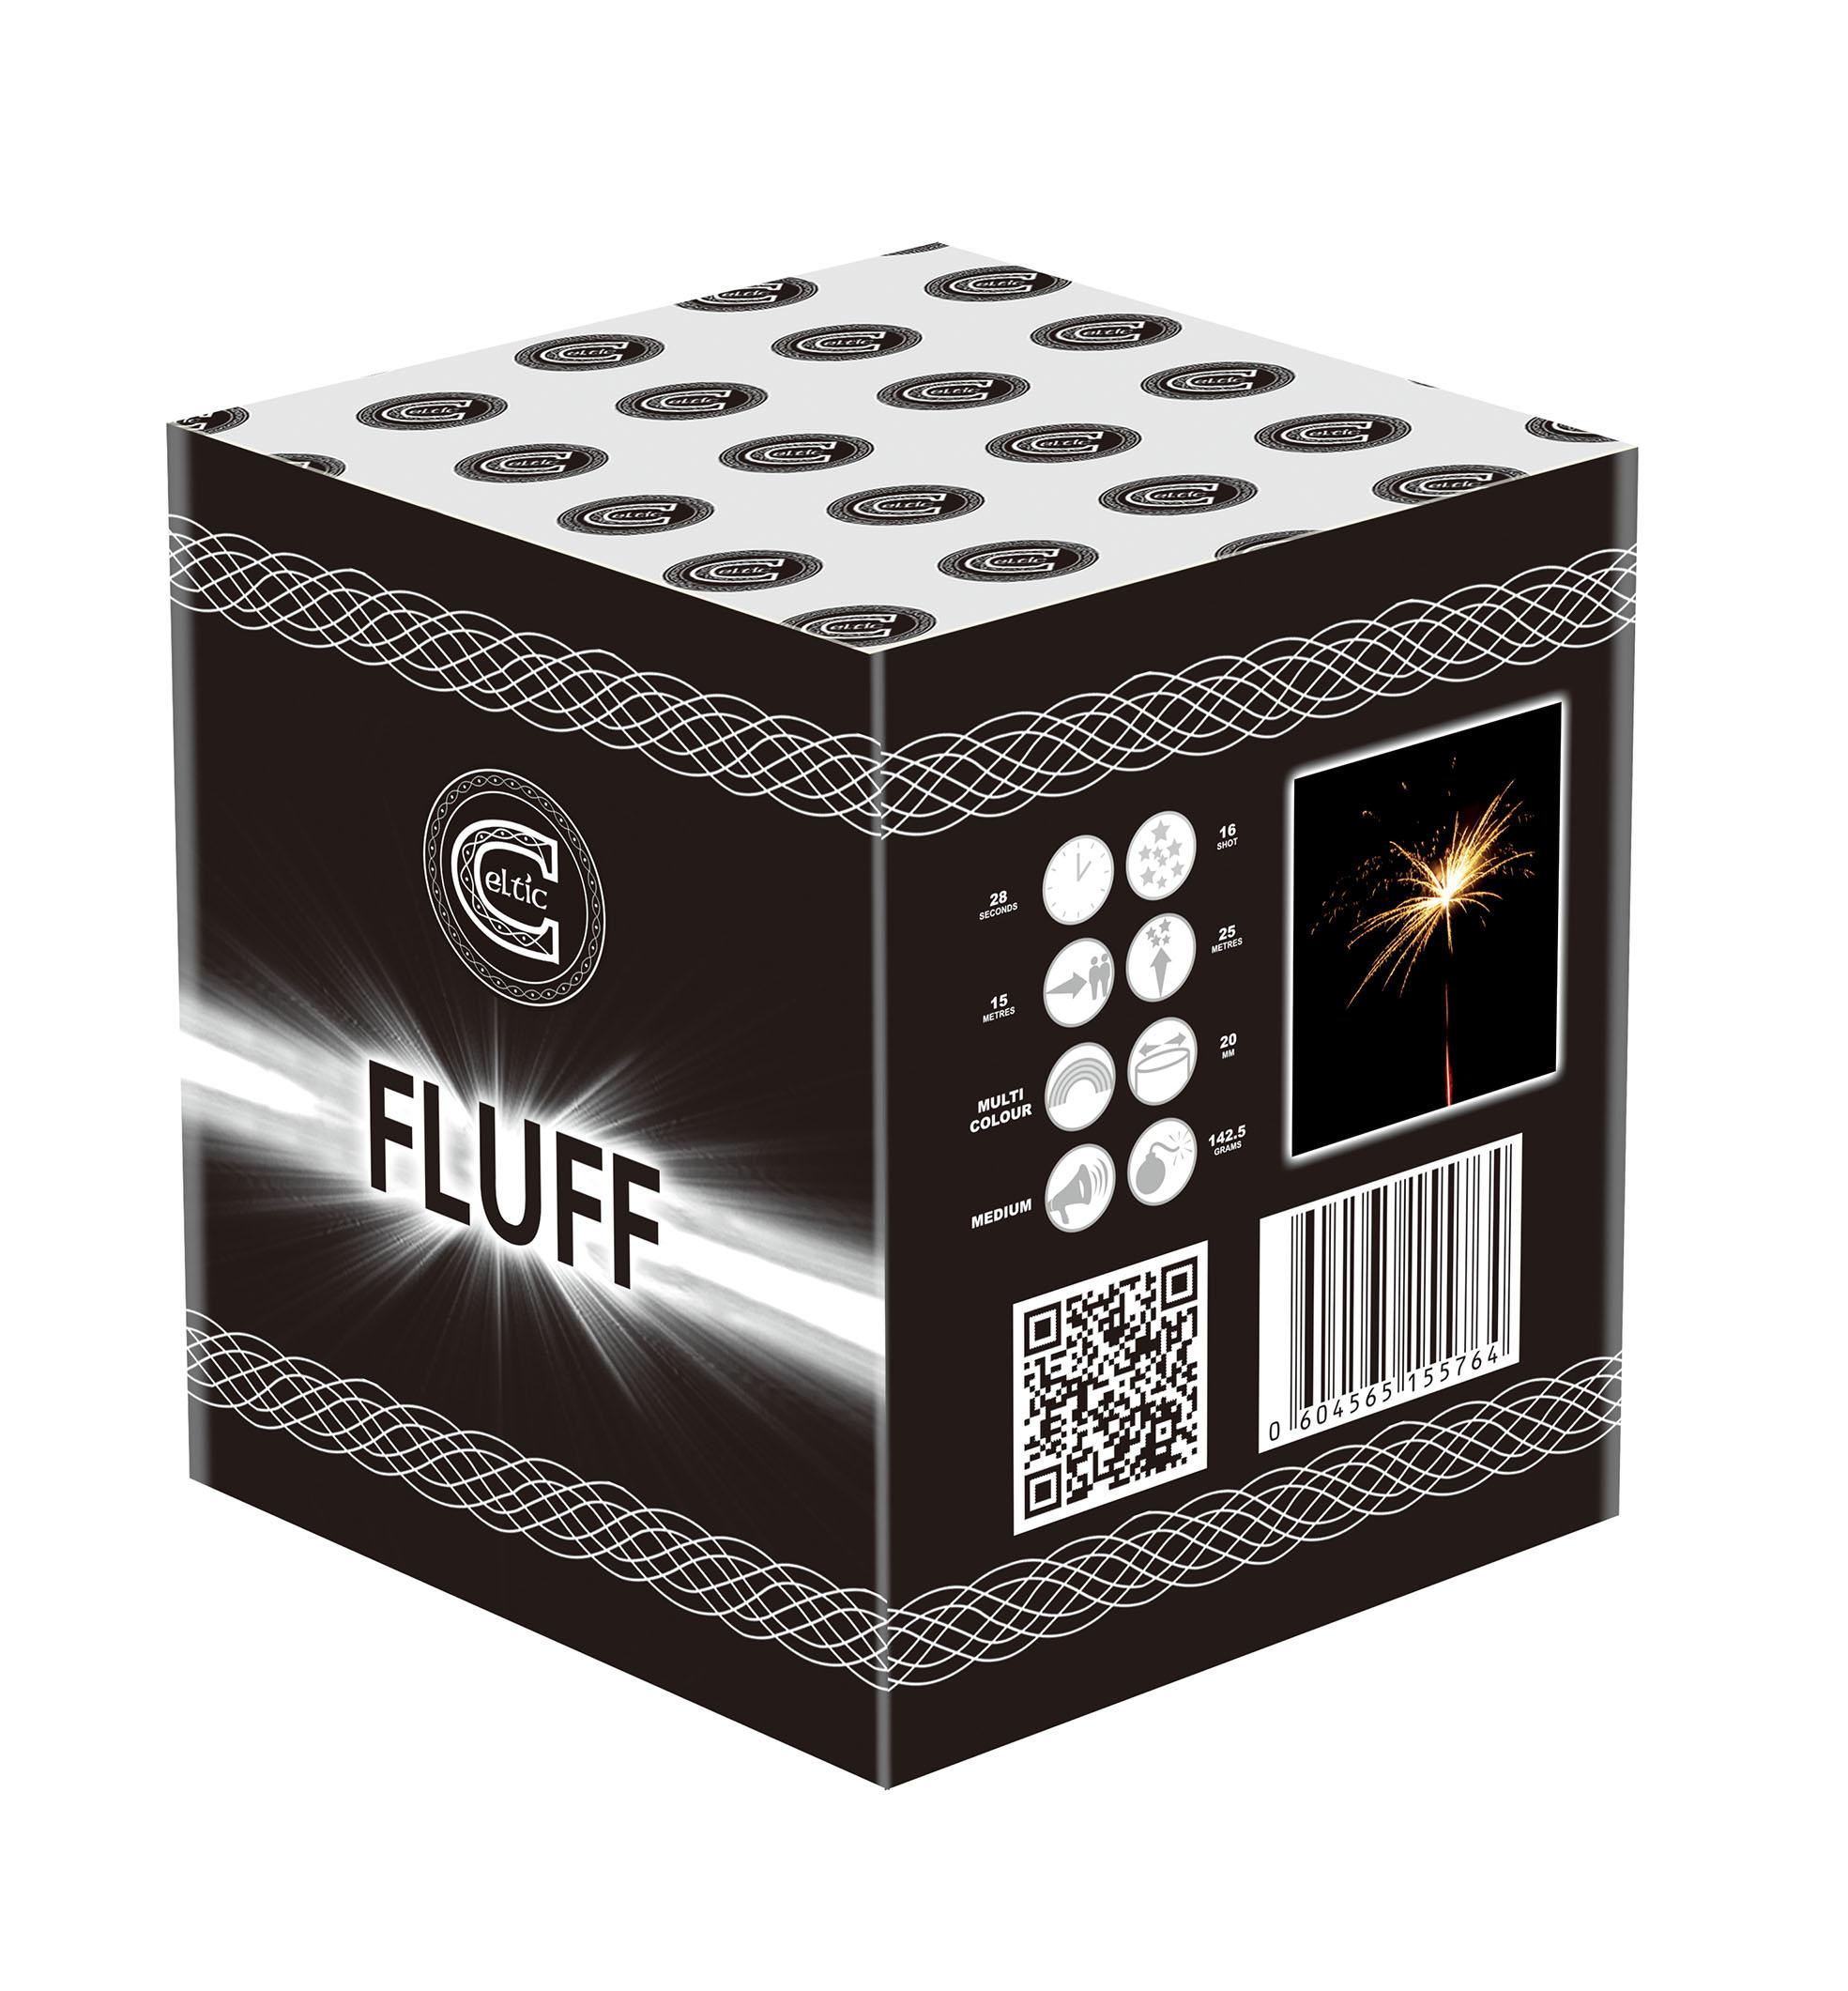 Fluff By Celtic Fireworks